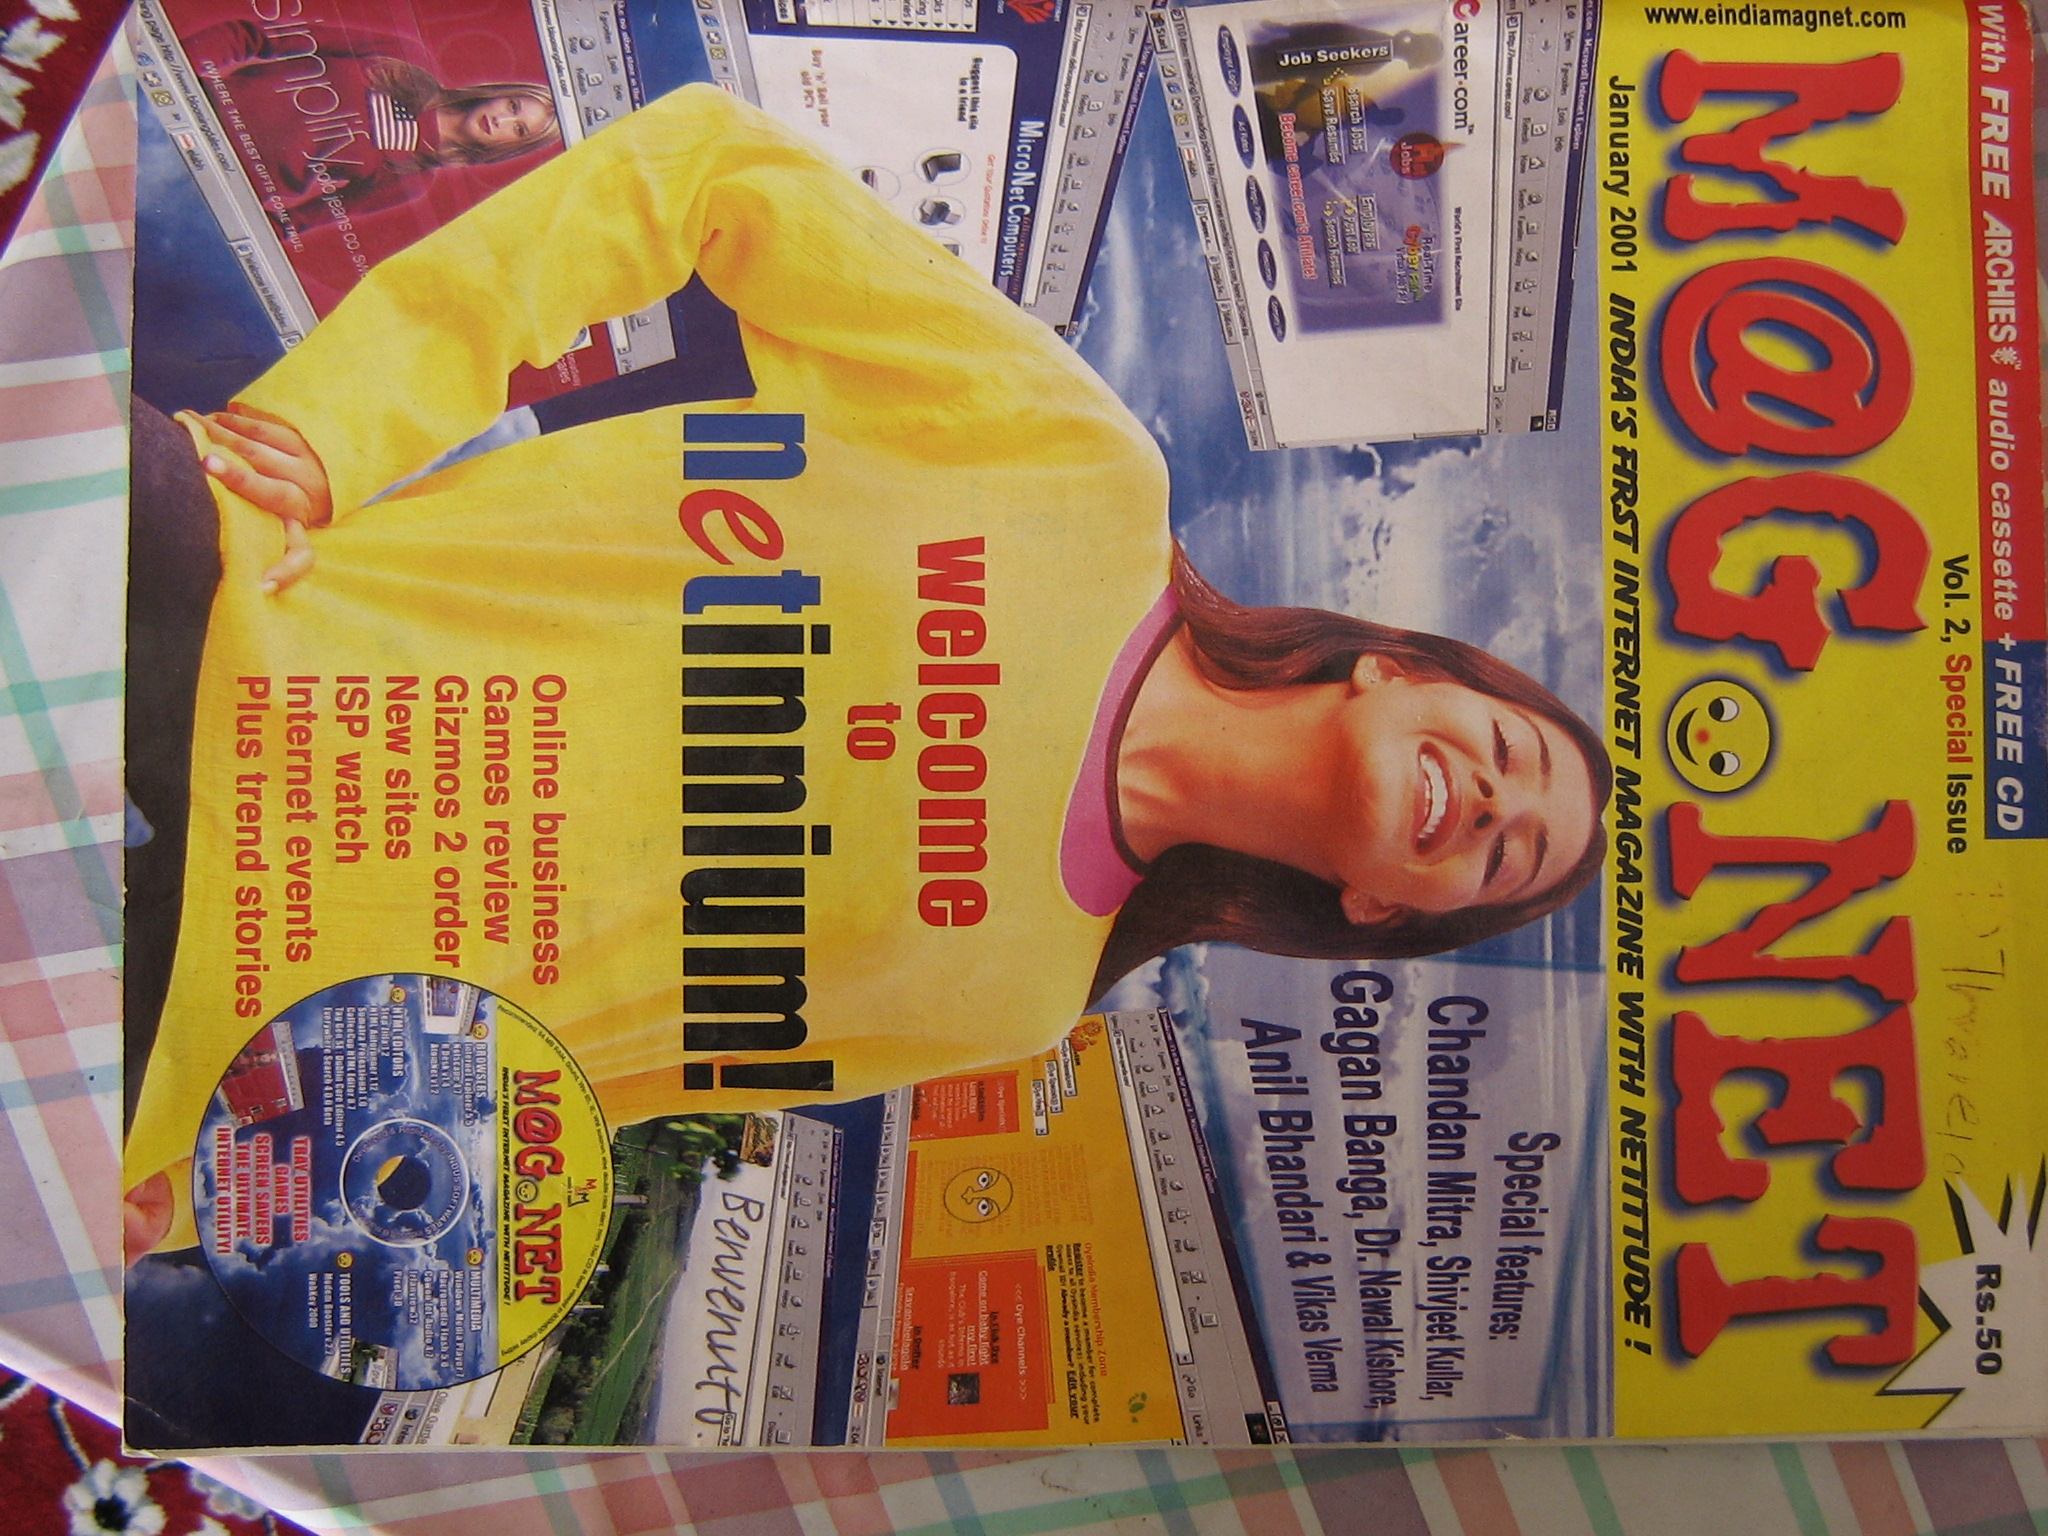 The Computer Monthly figuring Priyavrat Thareja